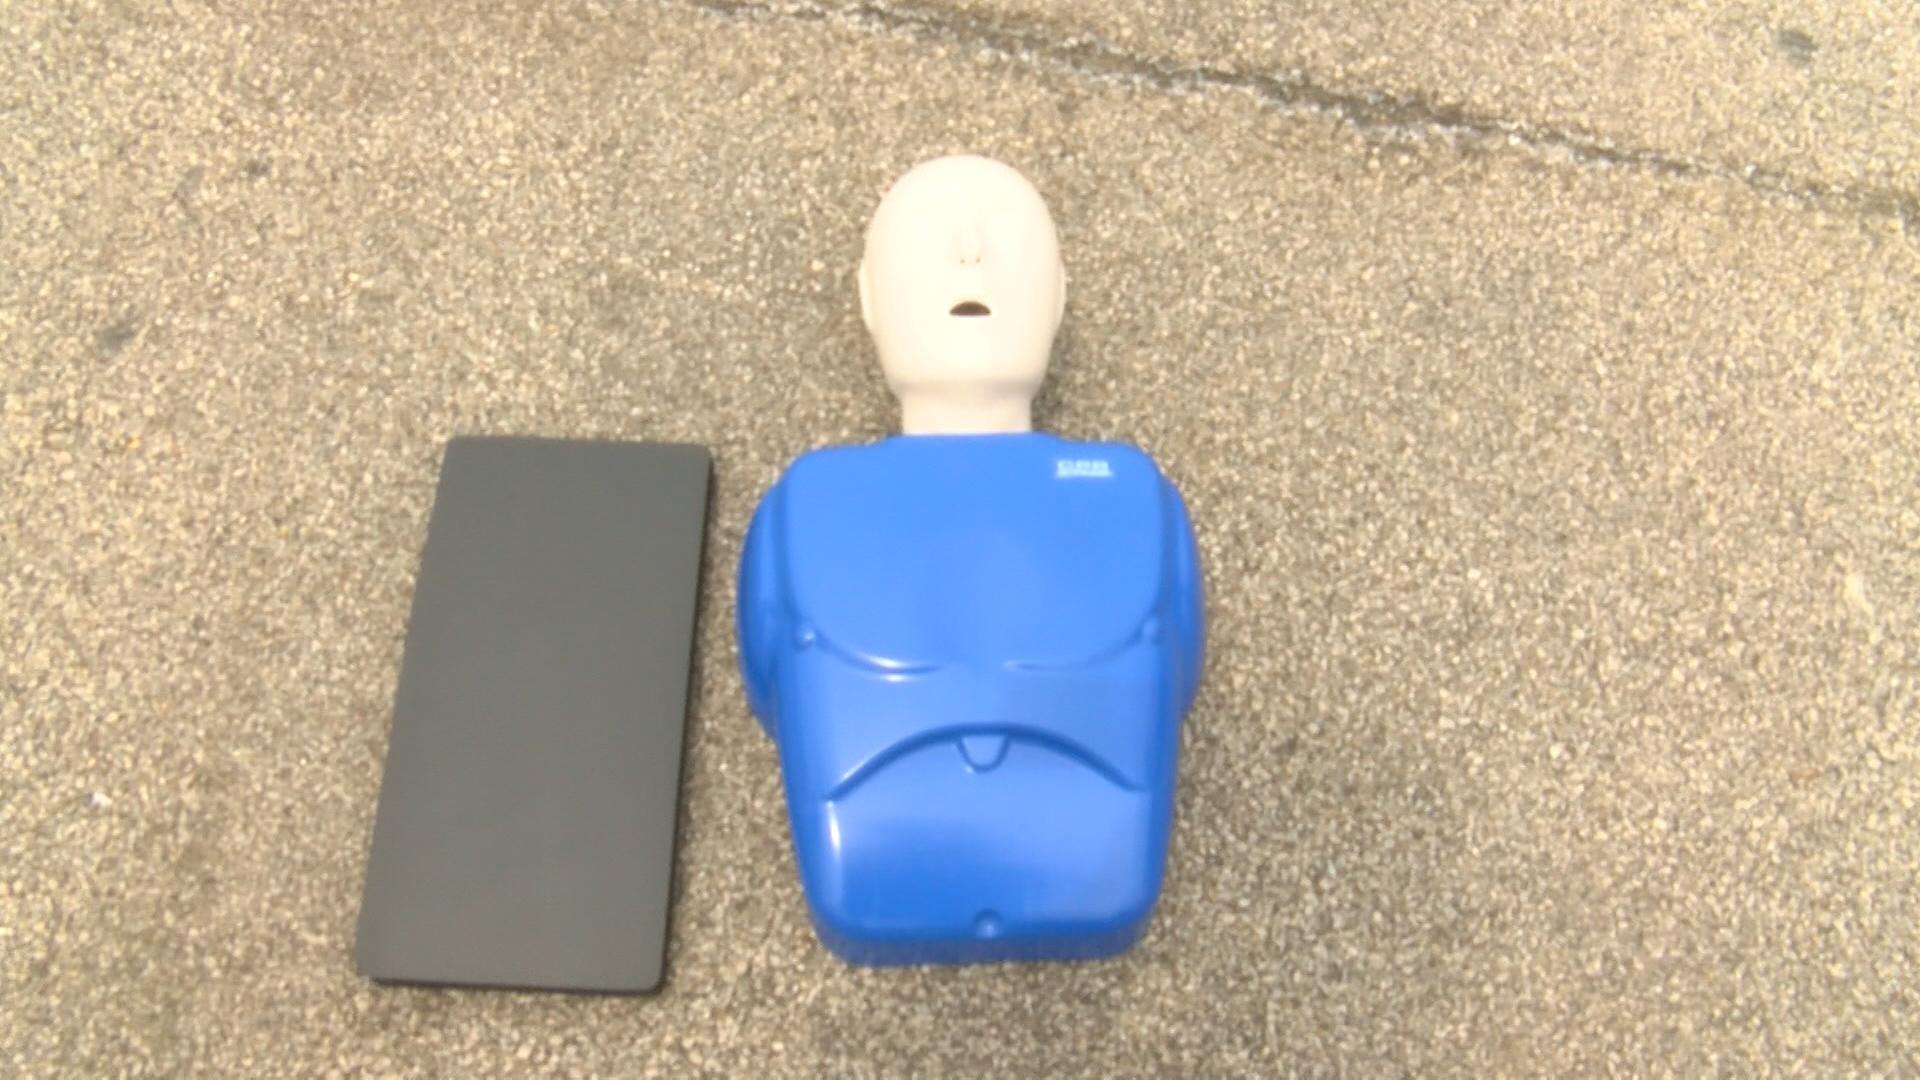 CPR NORTHWOODS MALL_1527992640333.jpg.jpg